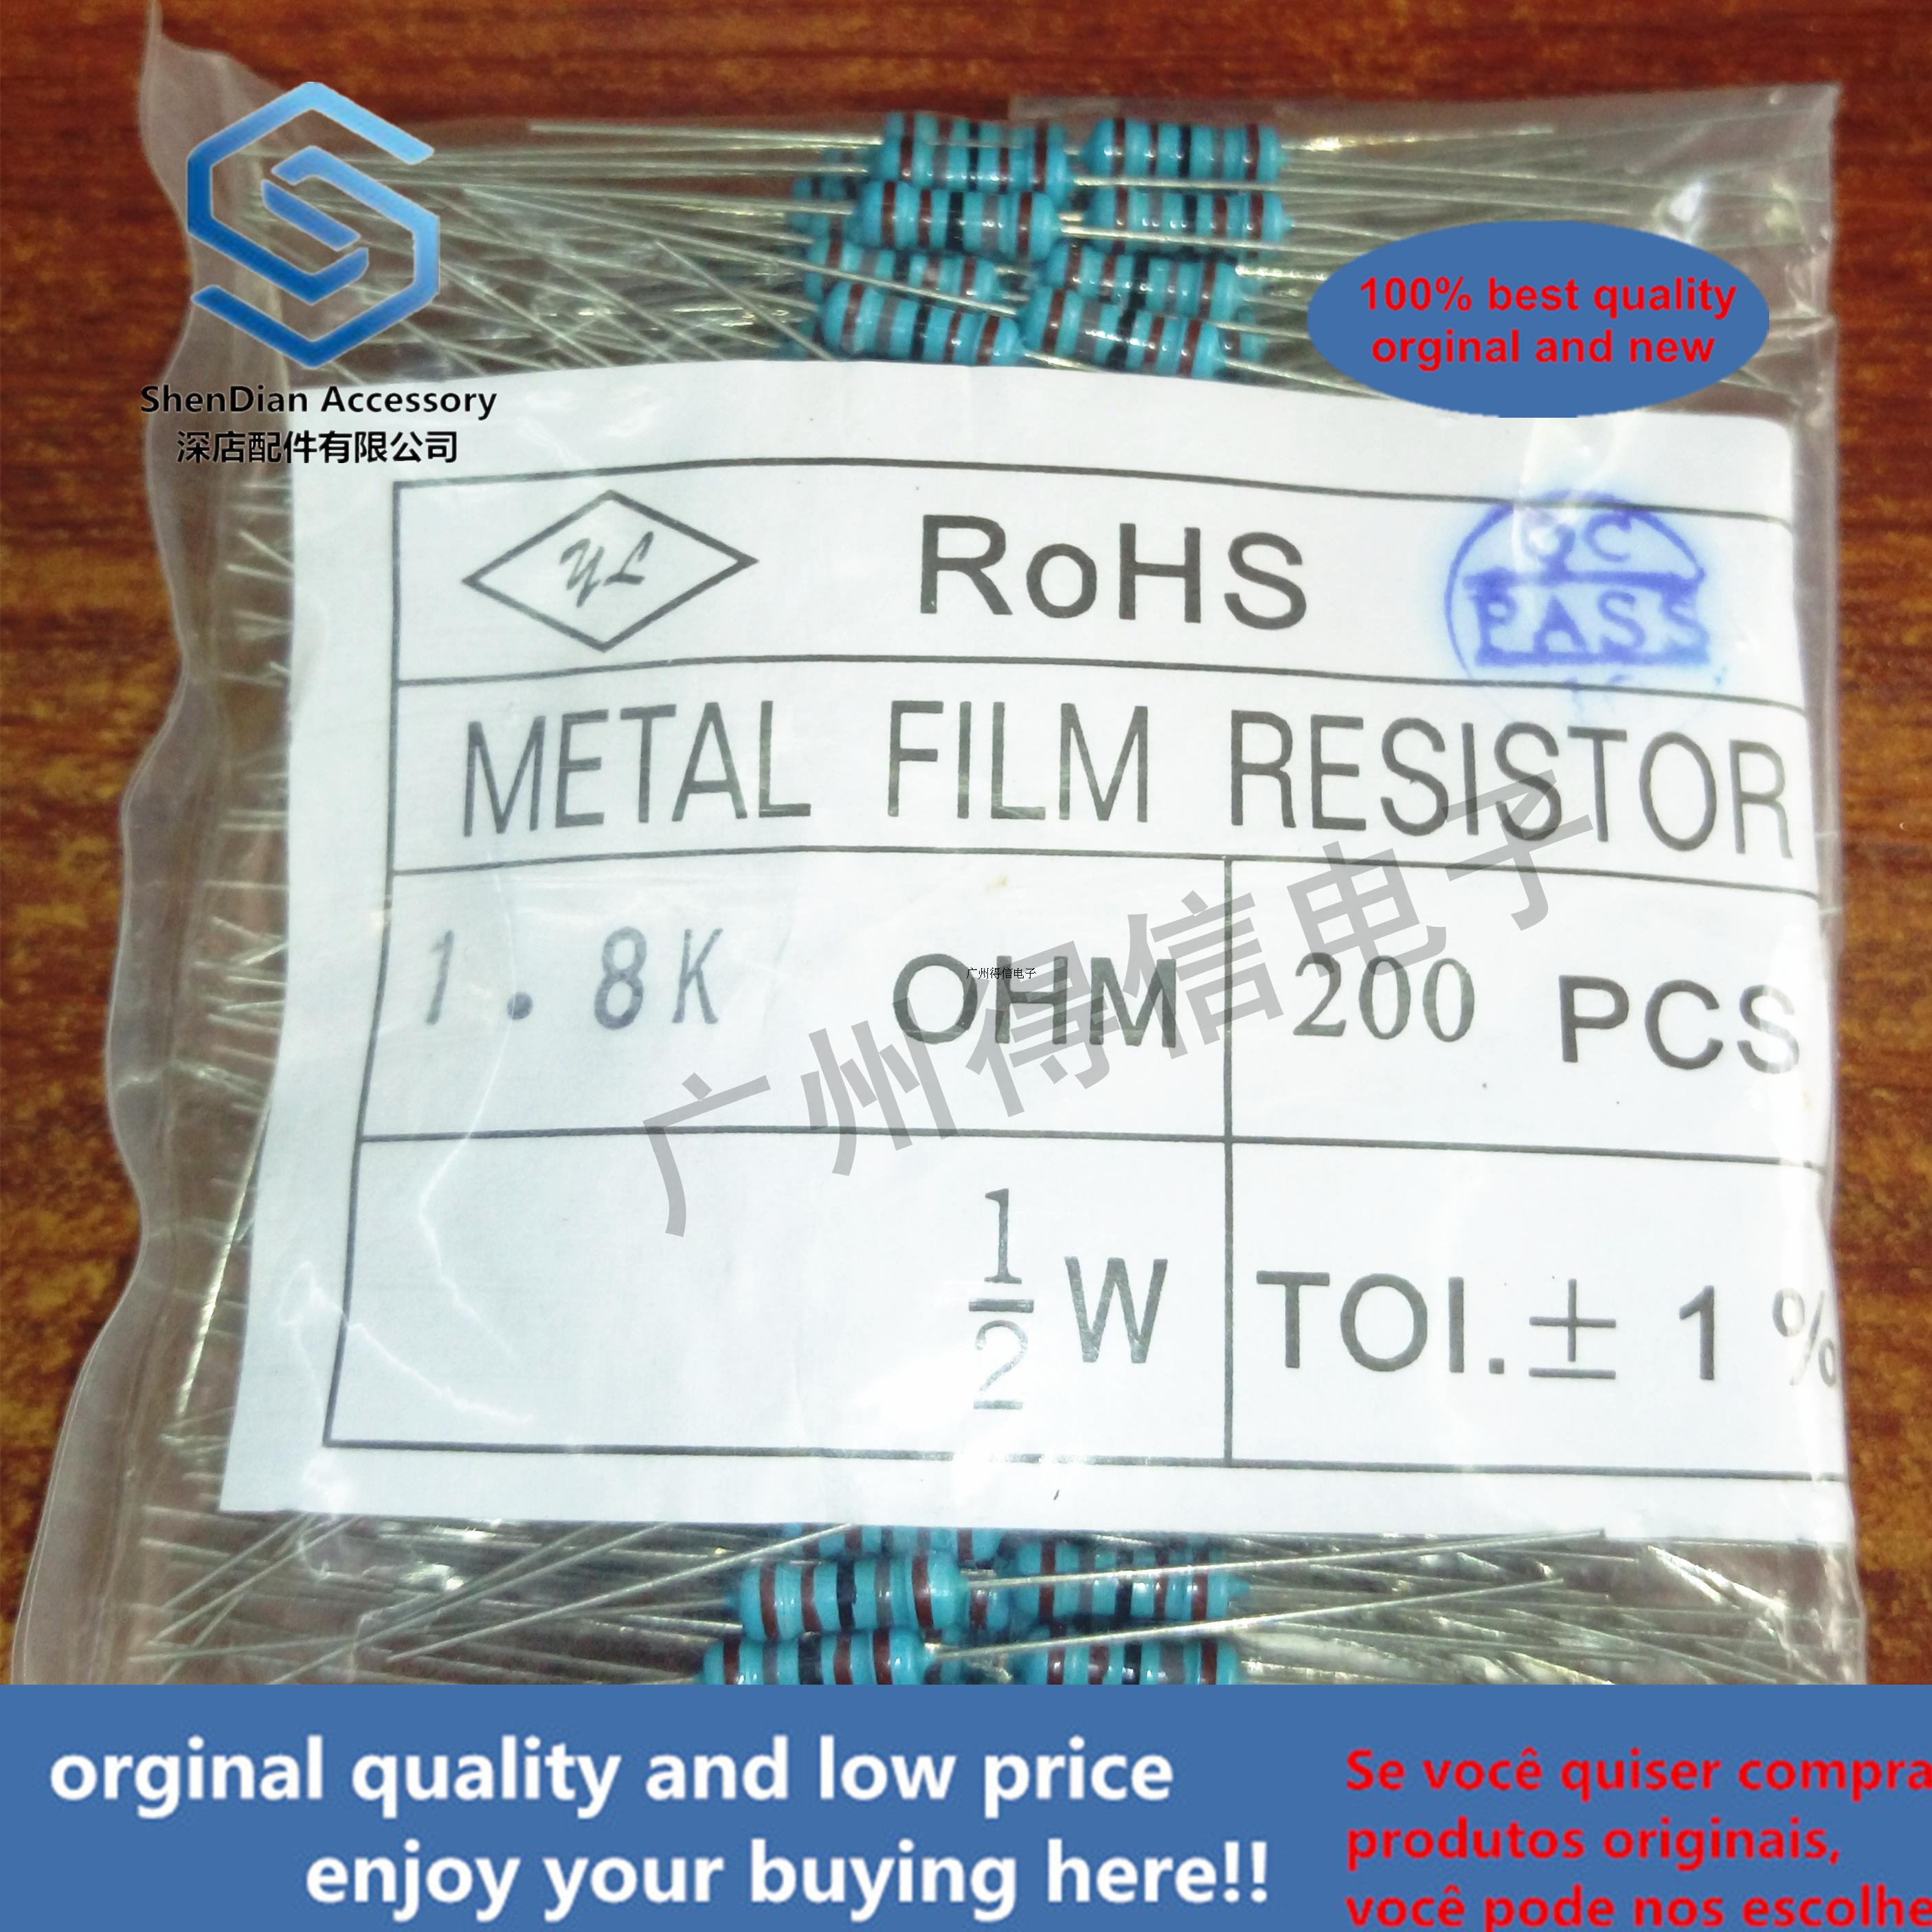 200pcs 1 / 2W 47R 47 Euro 1% Brand New Metal Film Iron Feet Resistance Bag 200 Pcs Per Pack